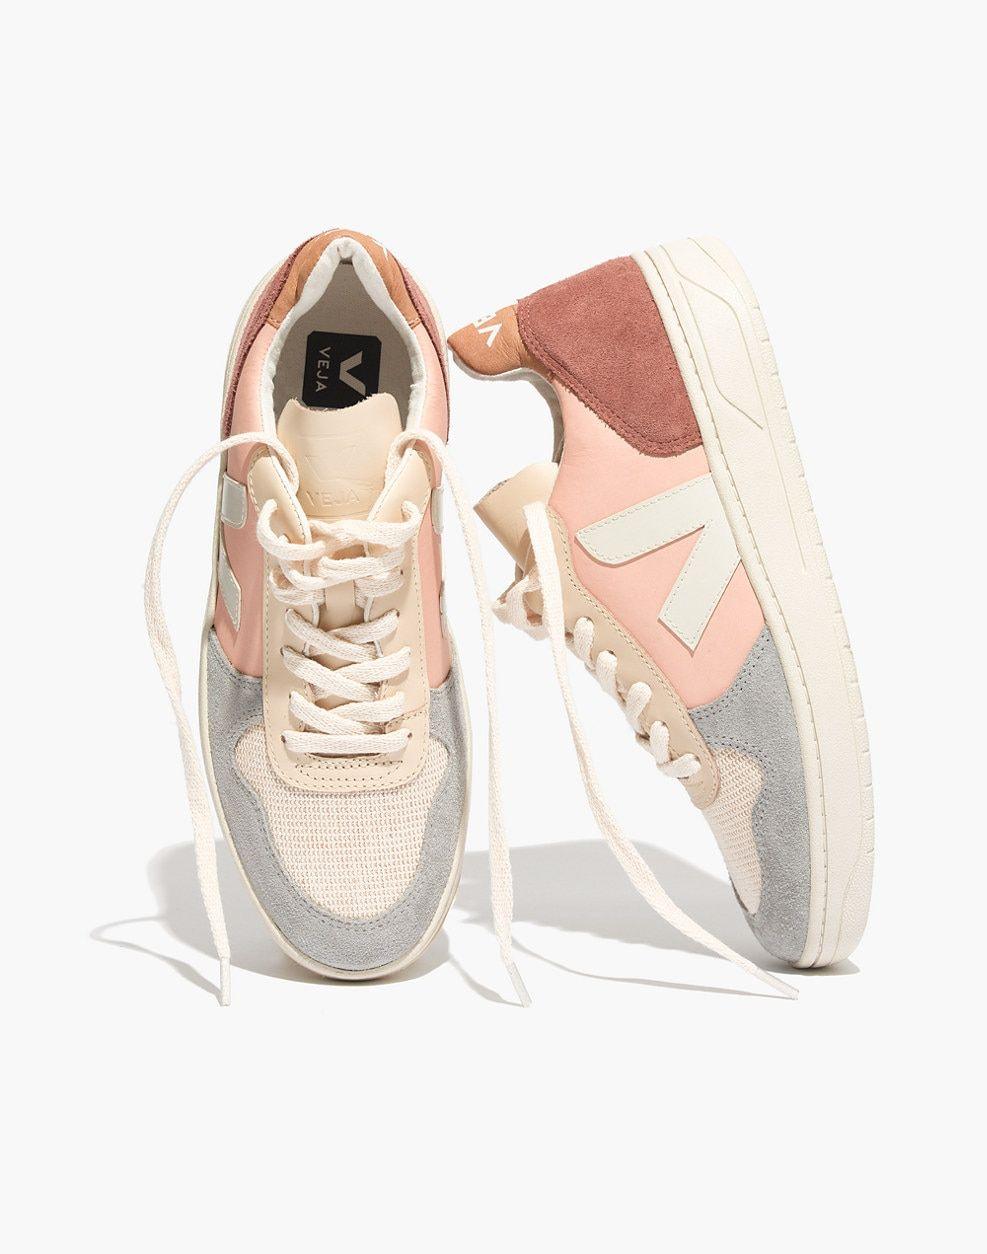 a8e183f81573c Veja™ V-10 Sneakers in Colorblock   sneakers